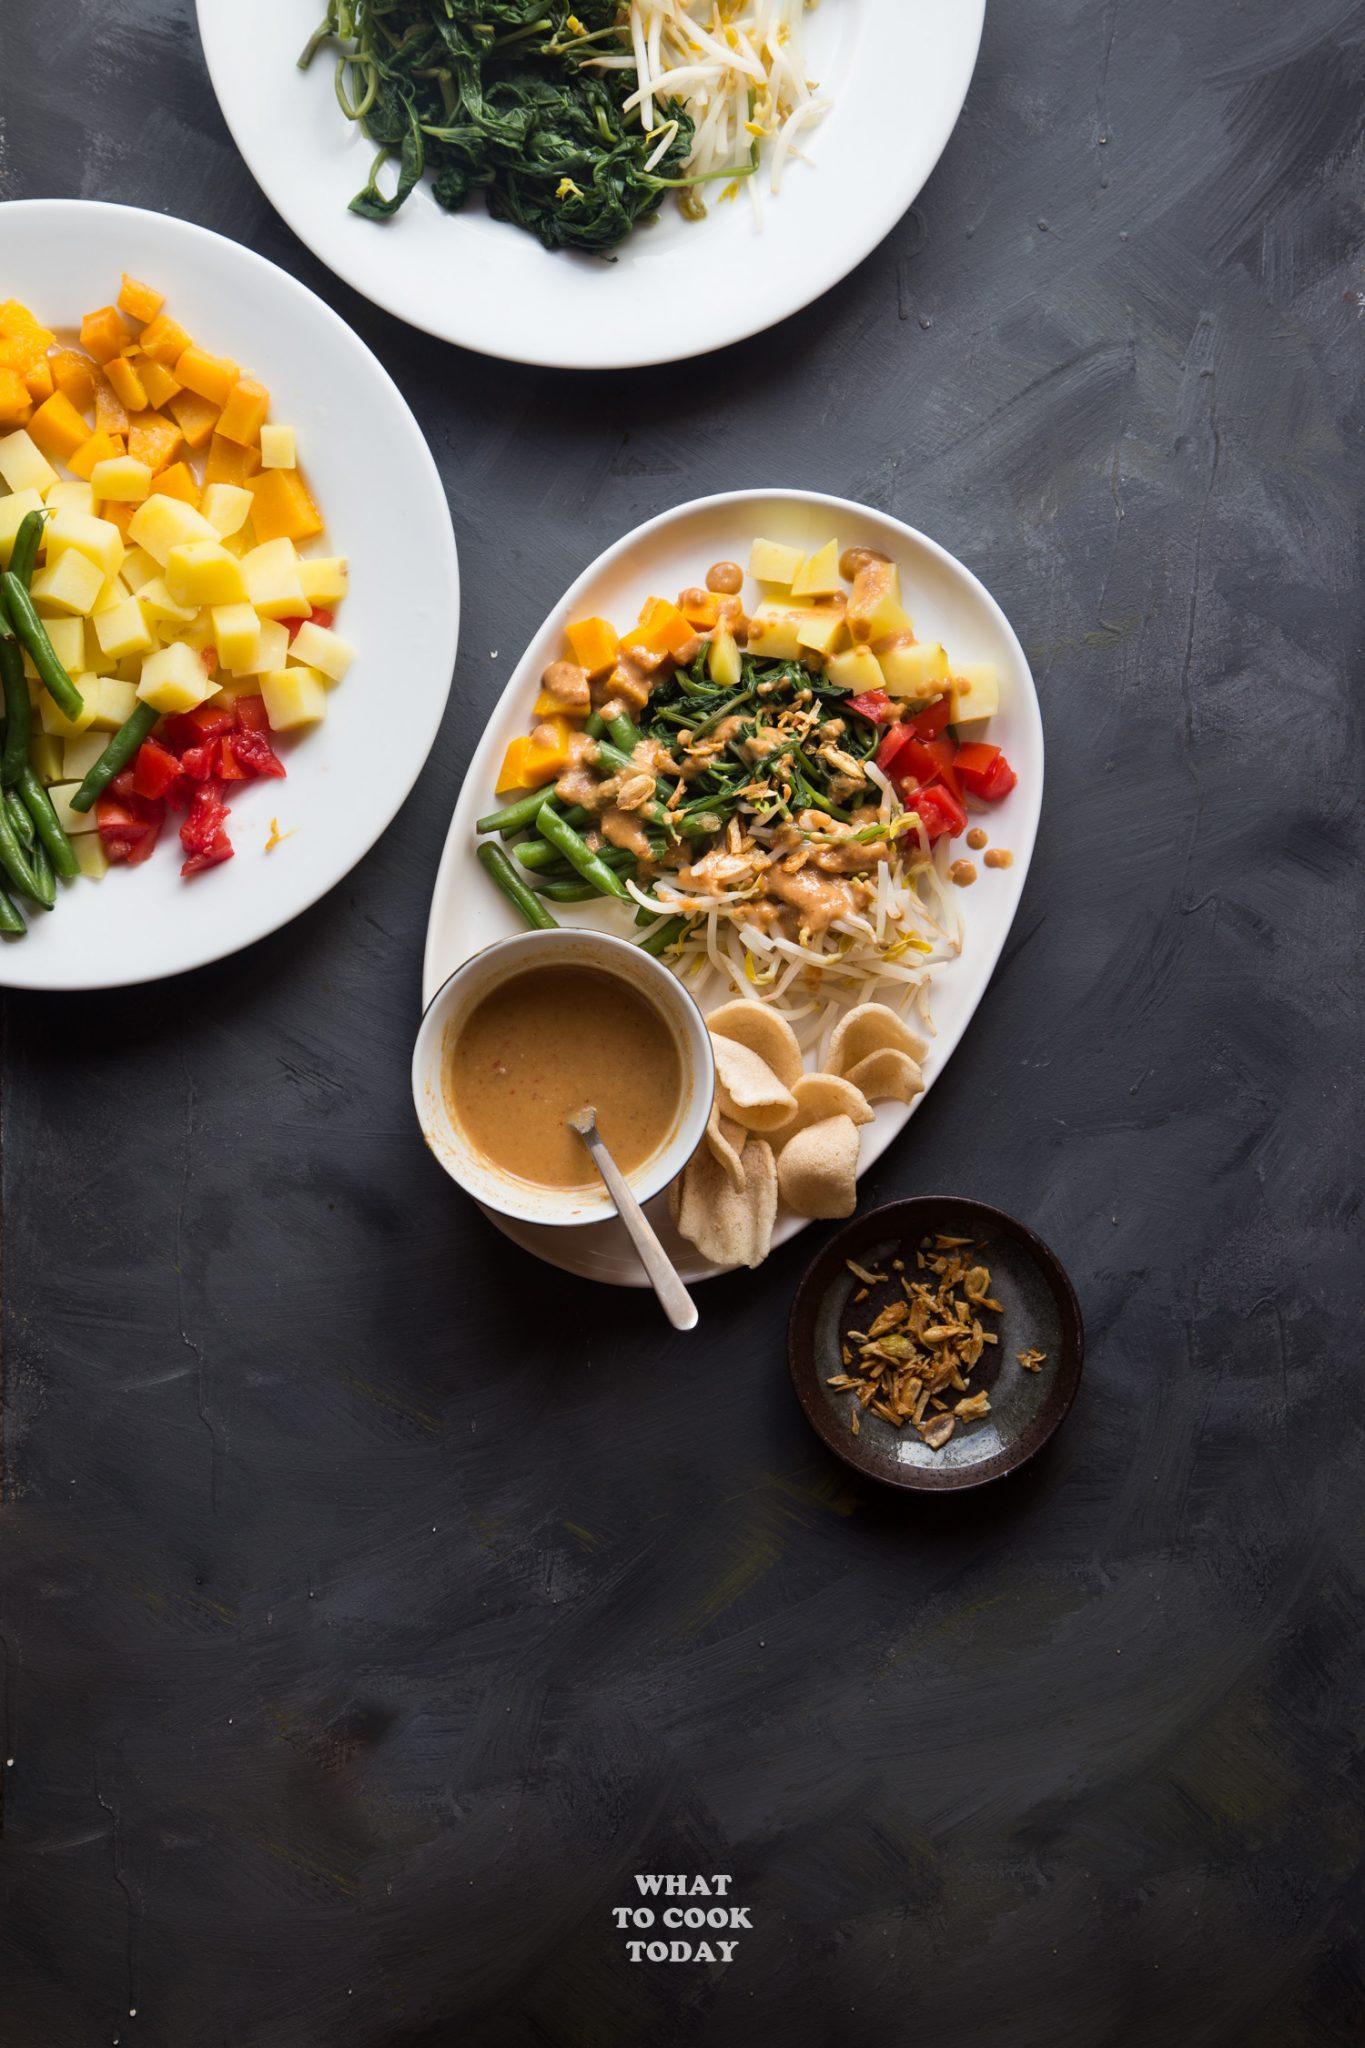 Lotek (Steamed Vegetable Salad with Peanut Dressing) #salad #lotek #indonesianrecipe #asianrecipe